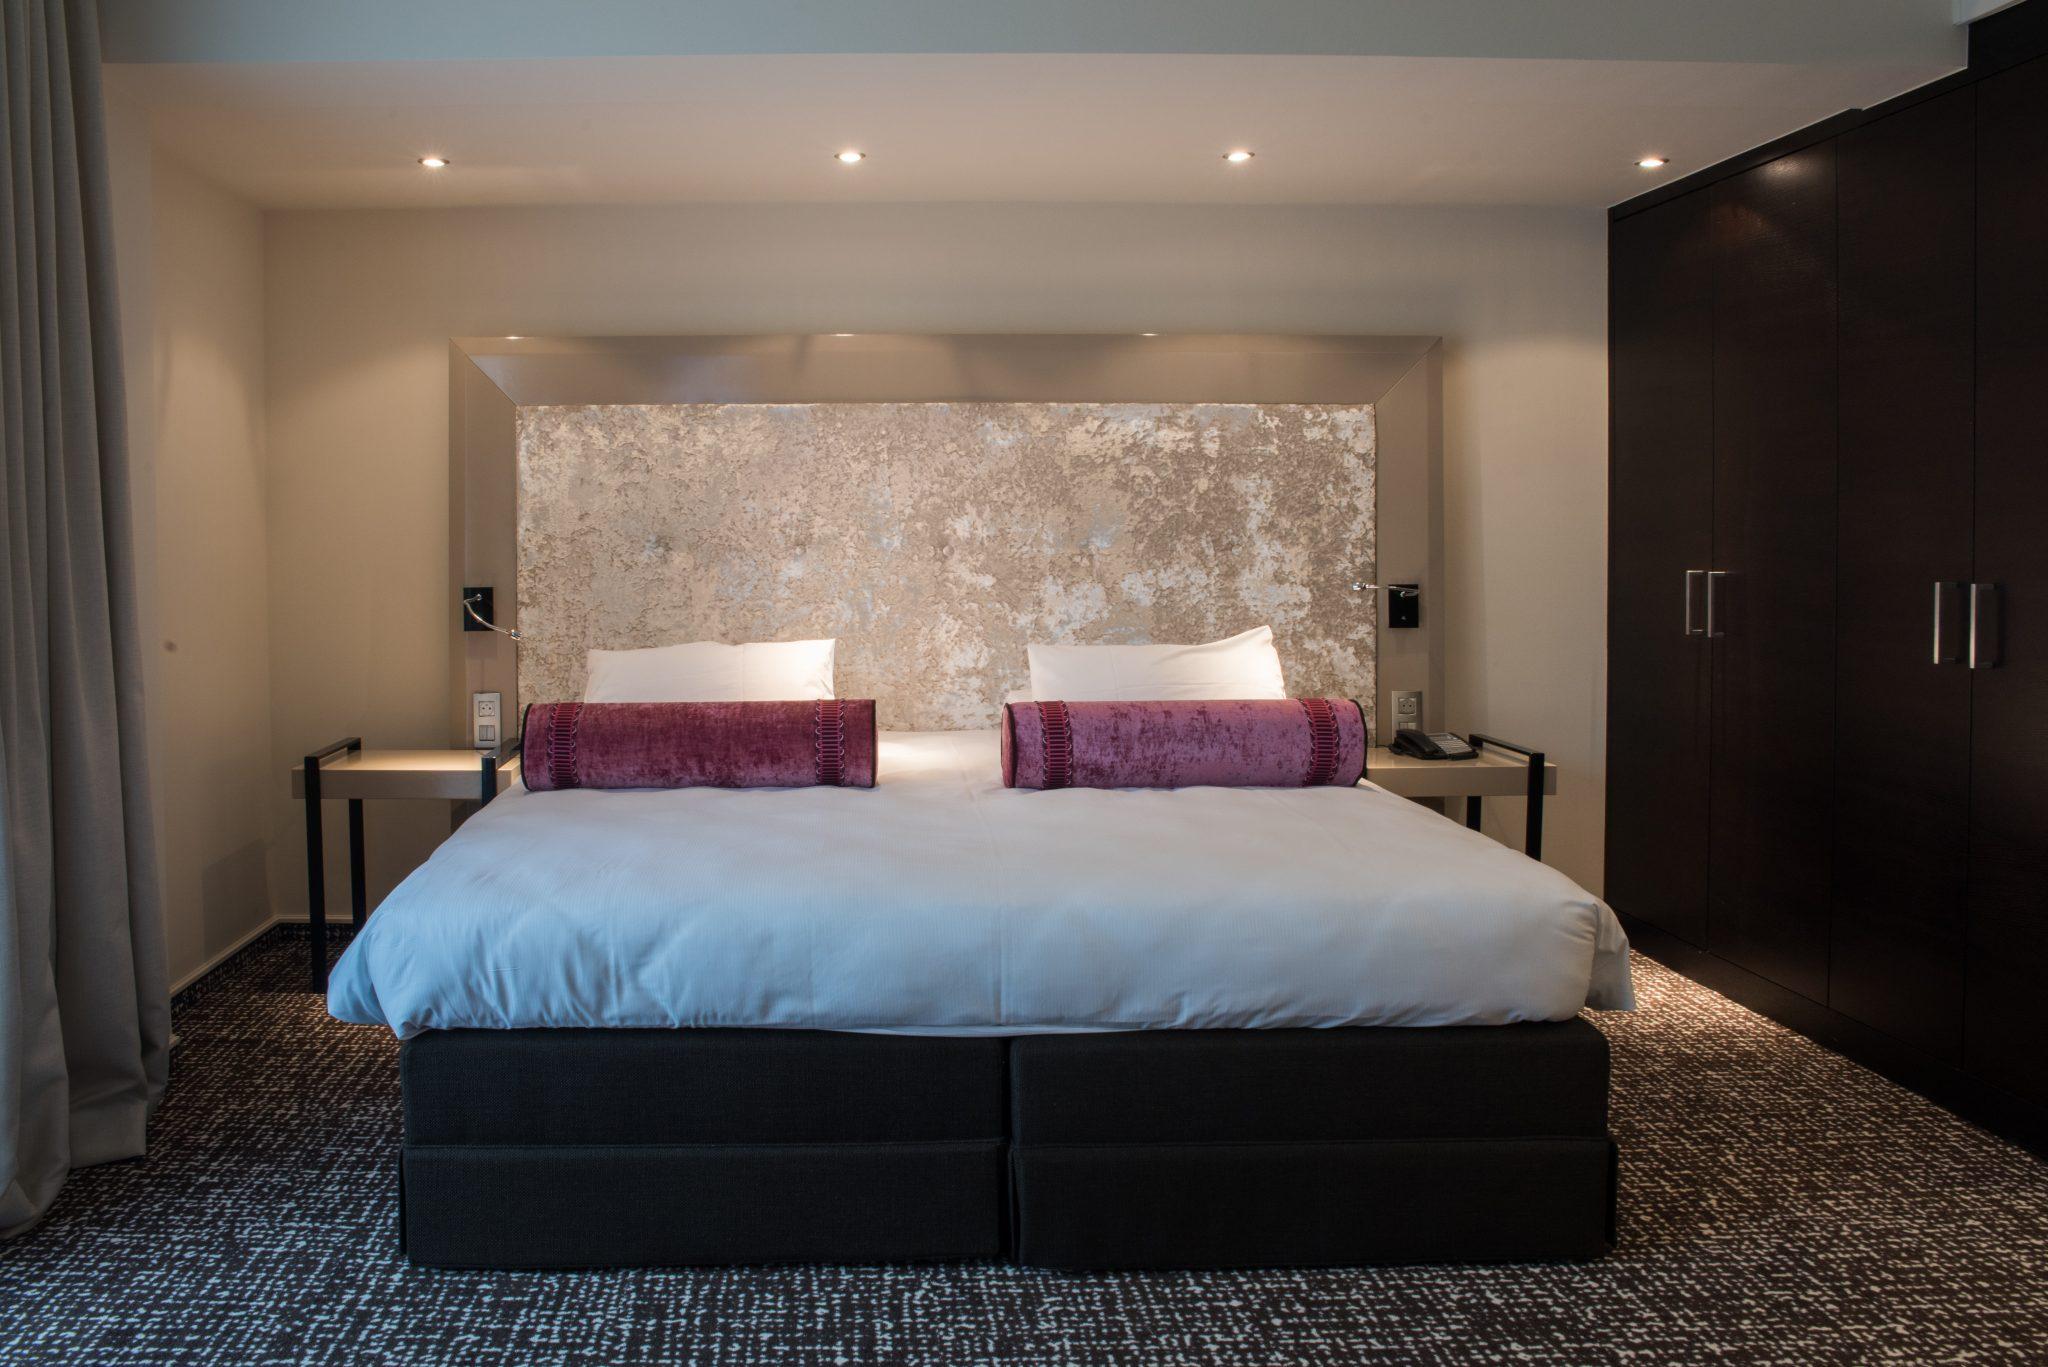 Hotel Confort TarasconsurAriege France